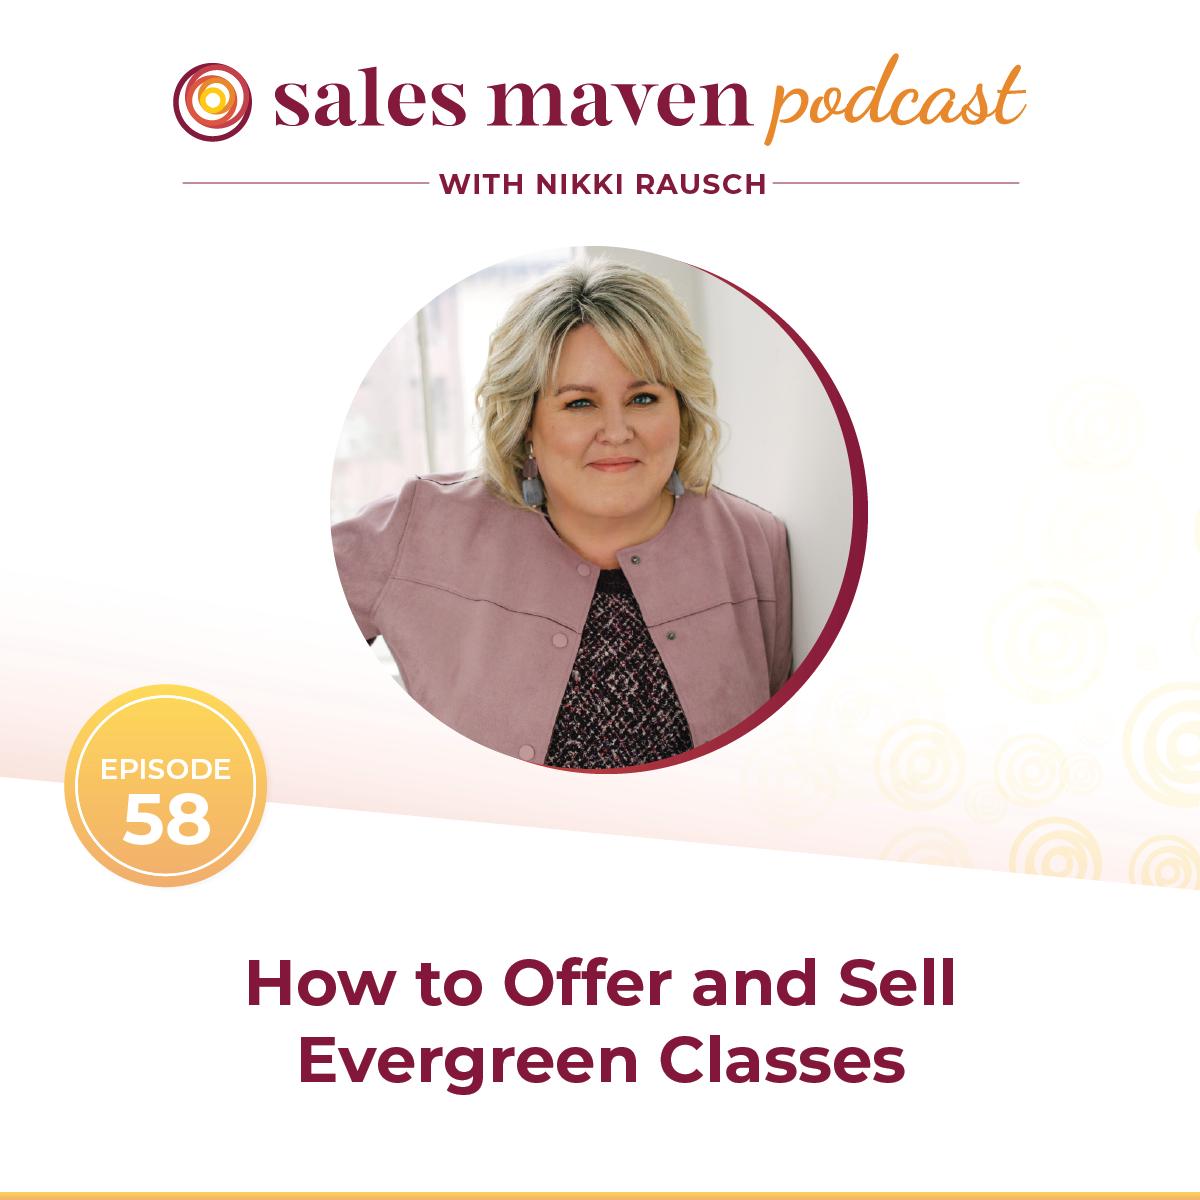 offer evergreen classes